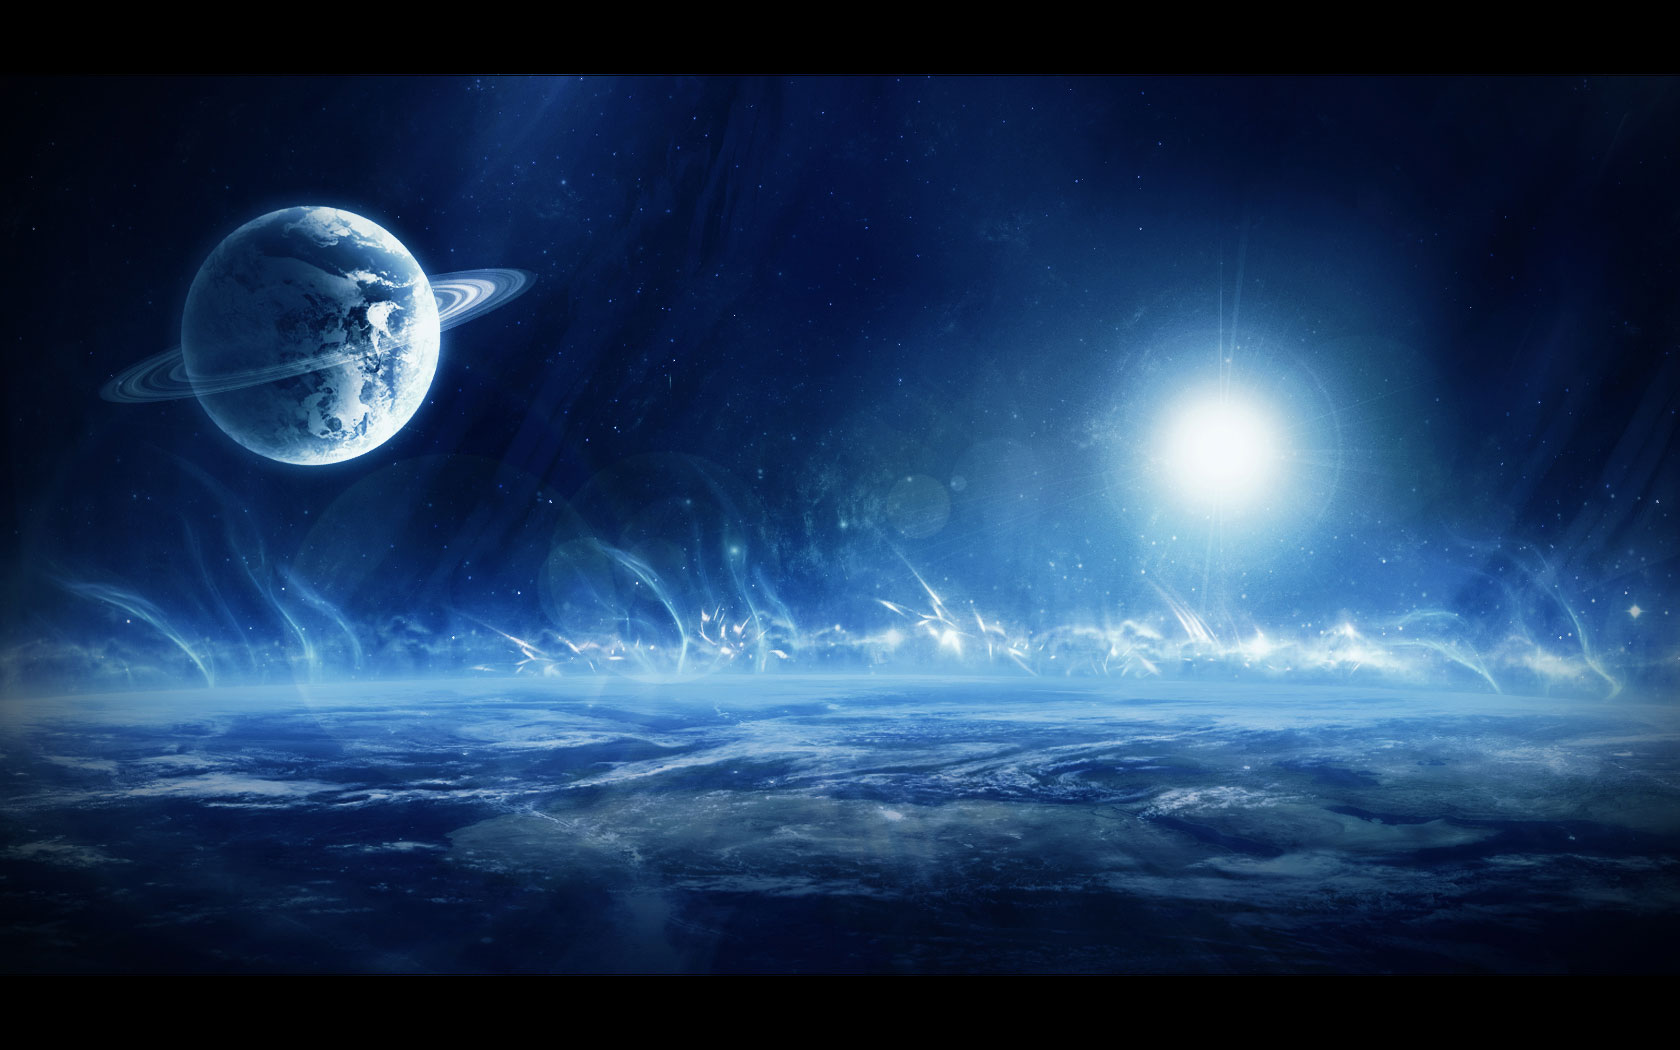 Real Space Wallpaper Hd Widescreen HD Space Wallpaper Wid...